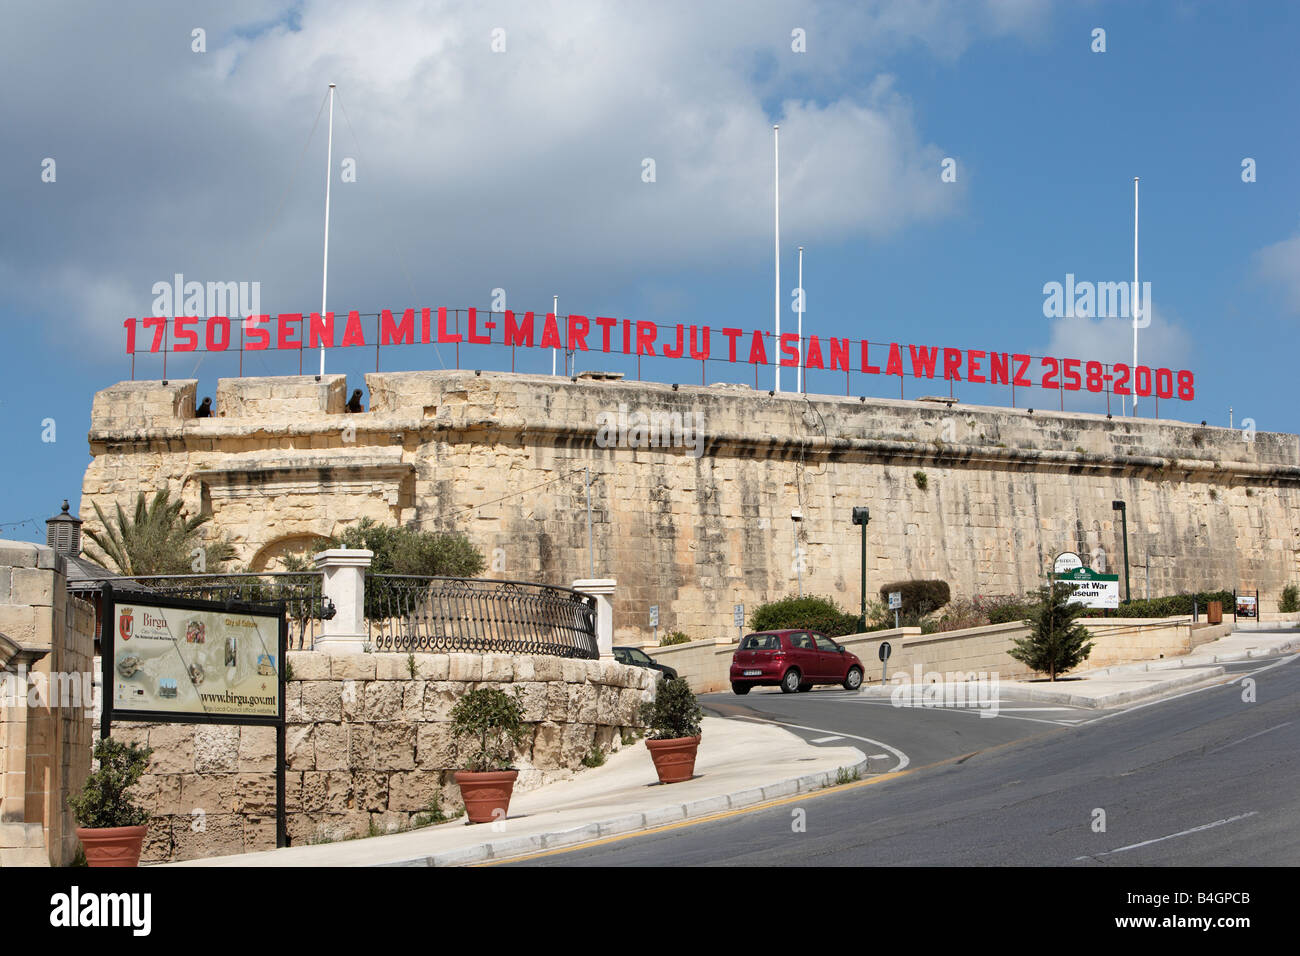 Vittoriosa Fort and Armoury, Malta - Stock Image